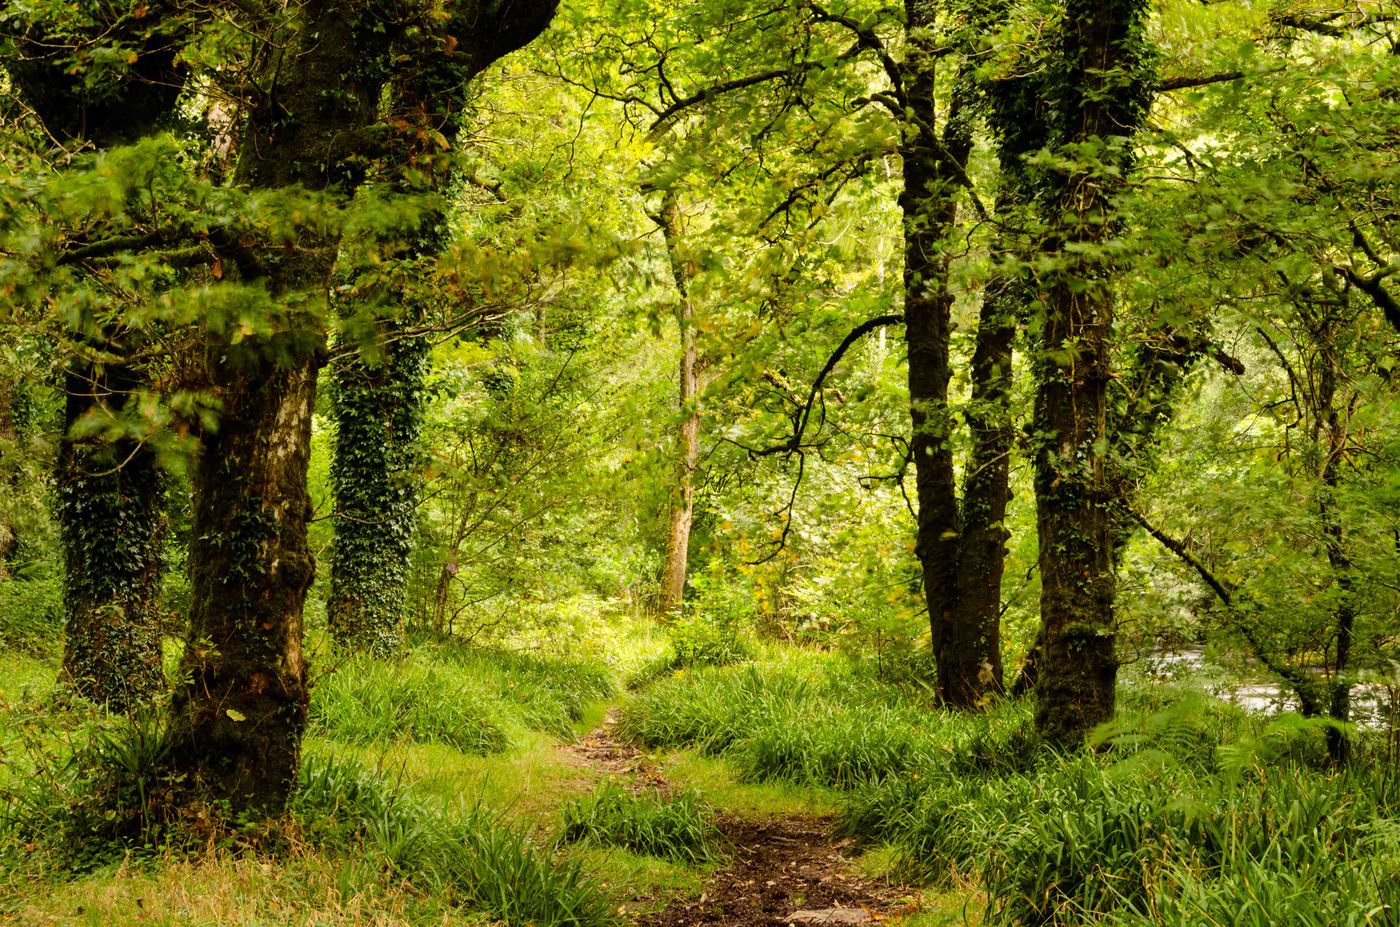 Sfeerbeeld van het bos in Exmoor. © Hans Debruyne